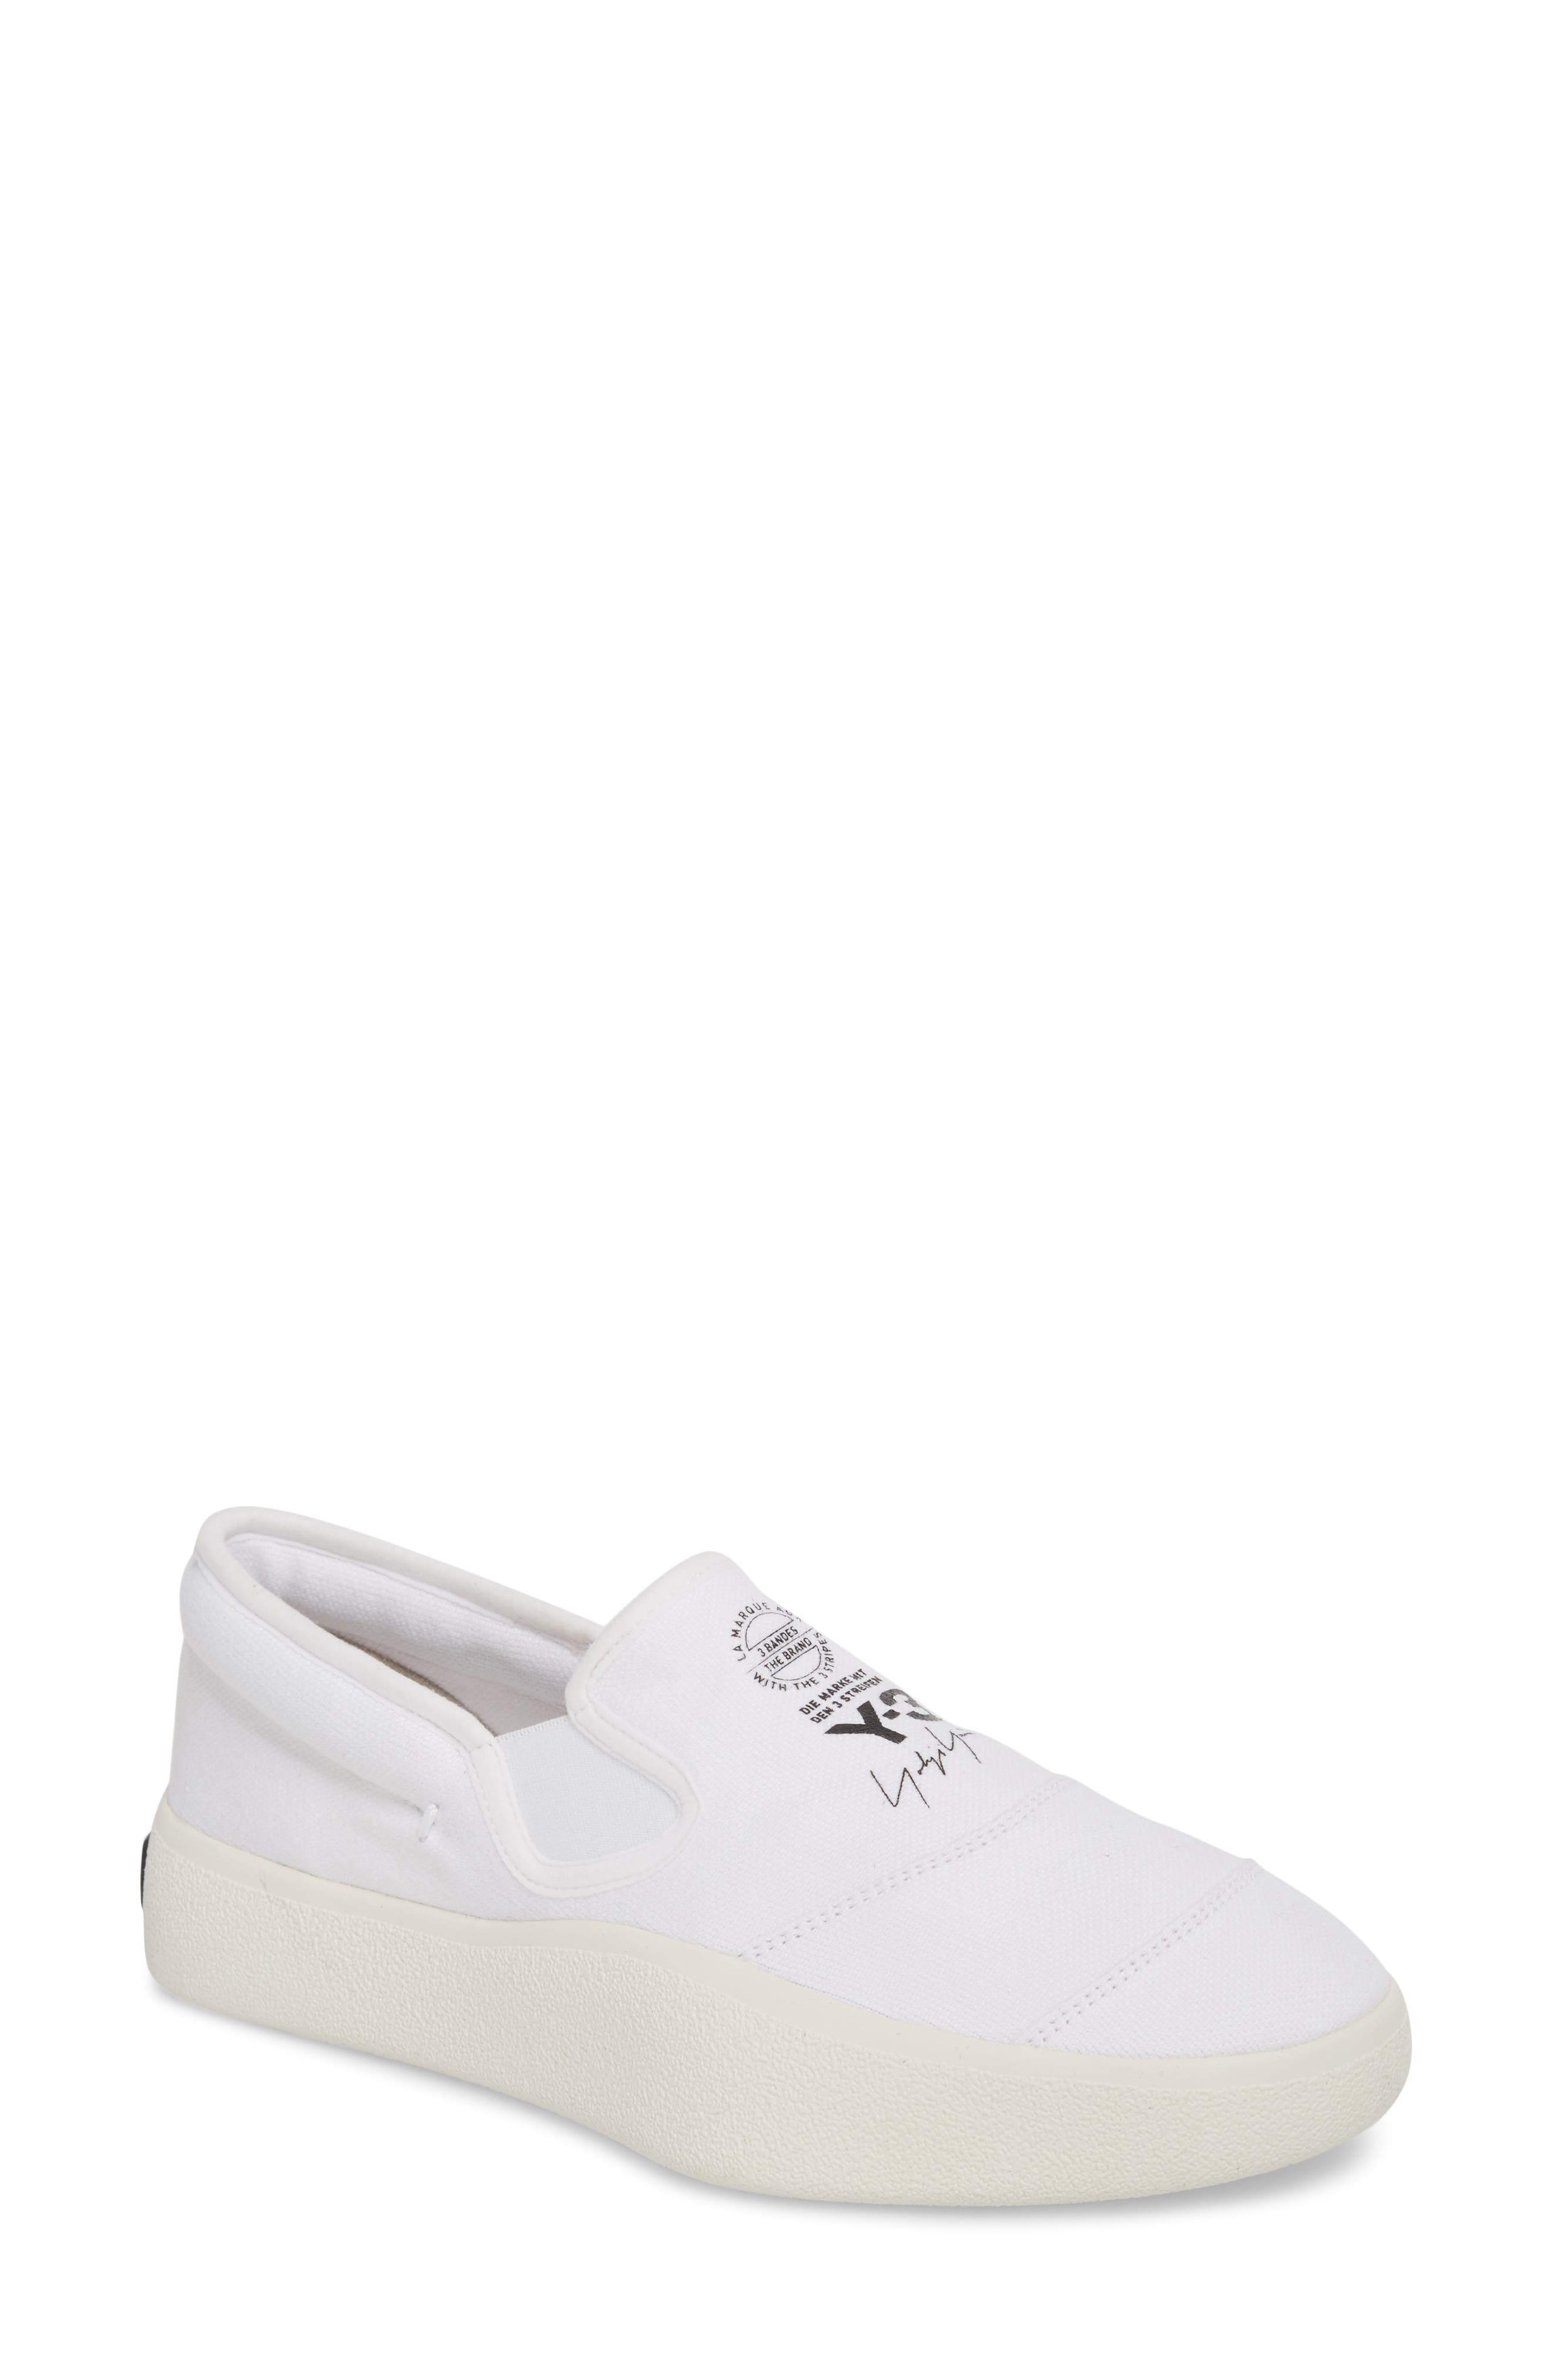 Tangutsu Slip-On Sneaker,                         Main,                         color, White / Black / Core White